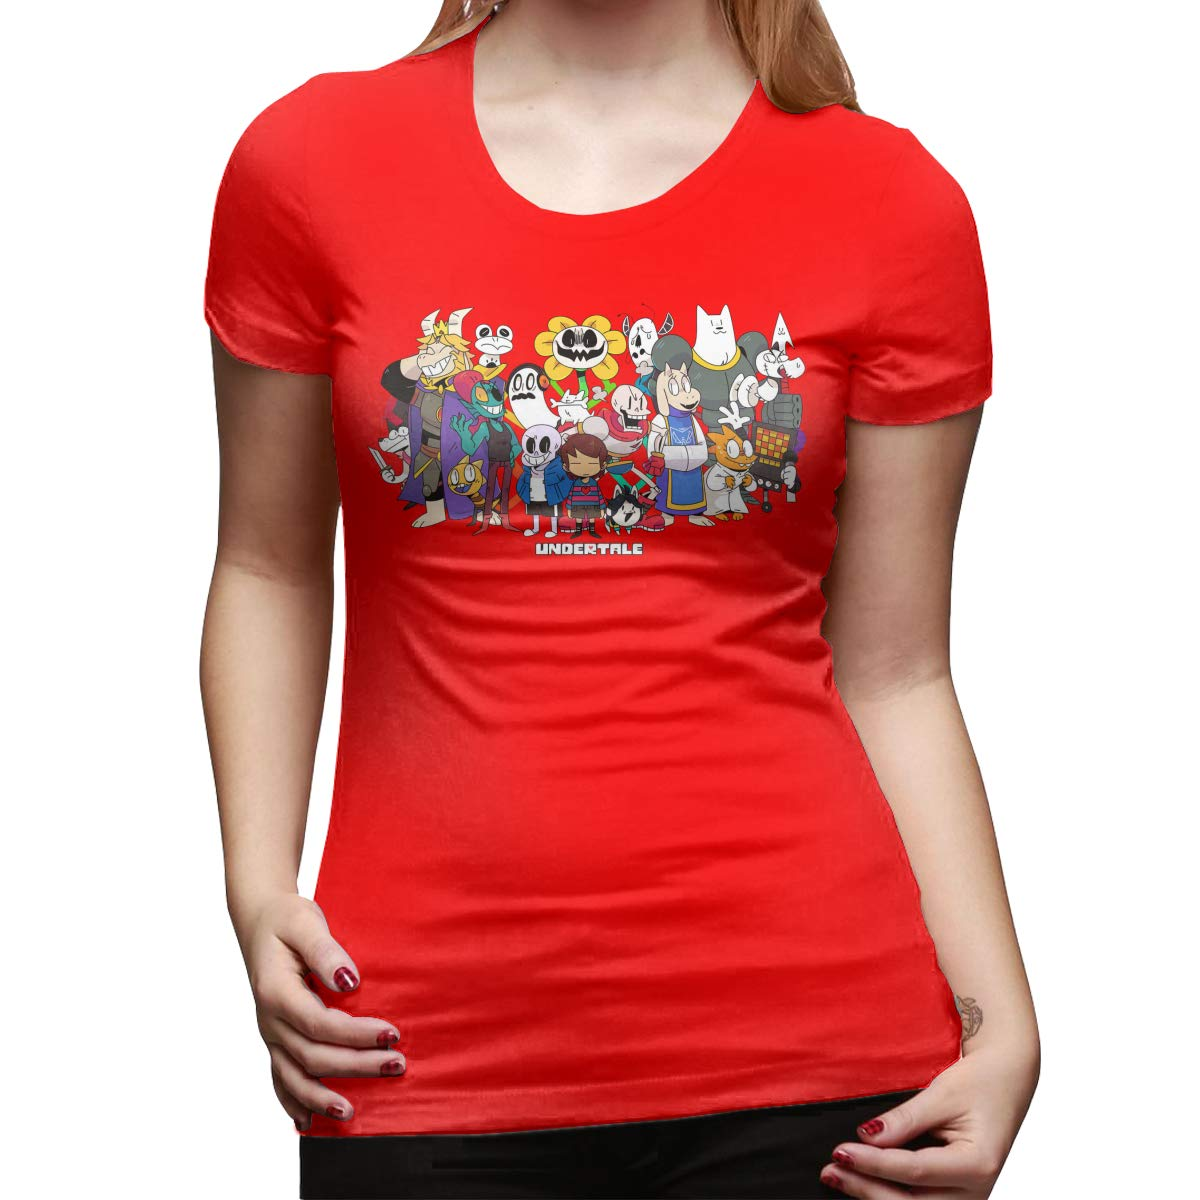 22 Short Sleeve Funny Shirt for Women Black KunYuHeng Personalized Undertale